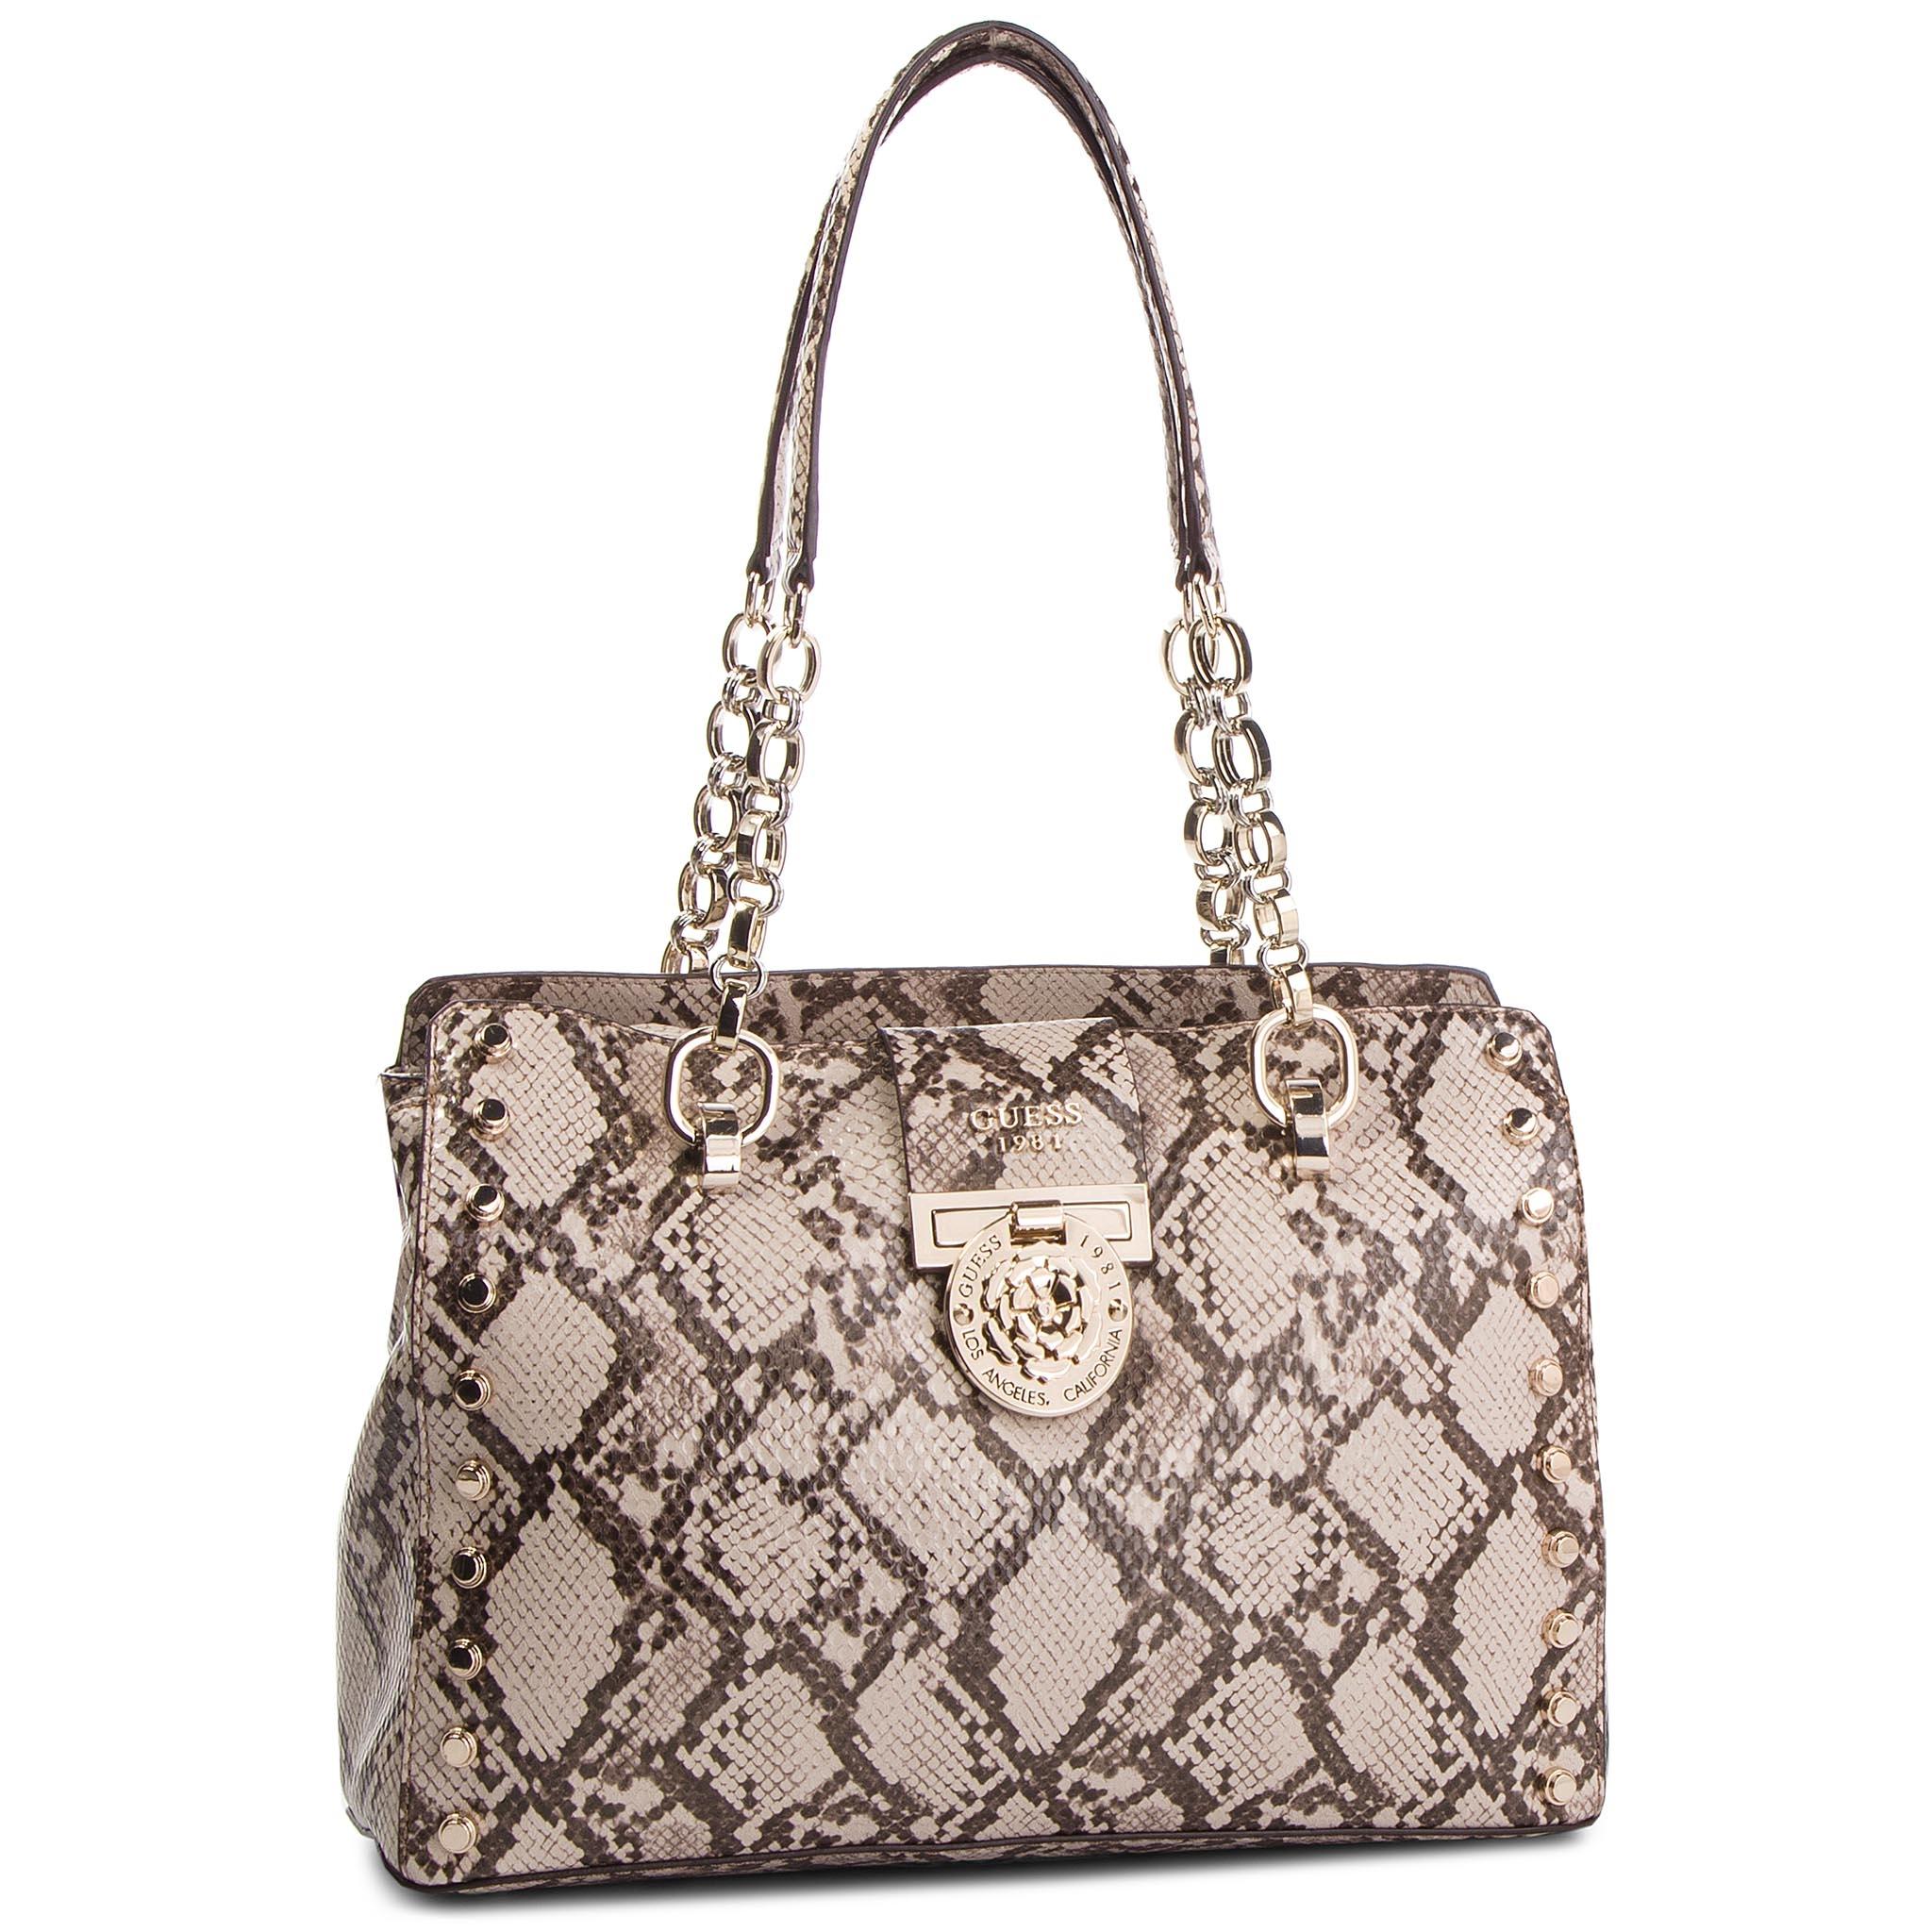 Personal Bustina Donna Petra Tuo Shophallo Shopping Il Beige vwYrUFv 9d3395ac856